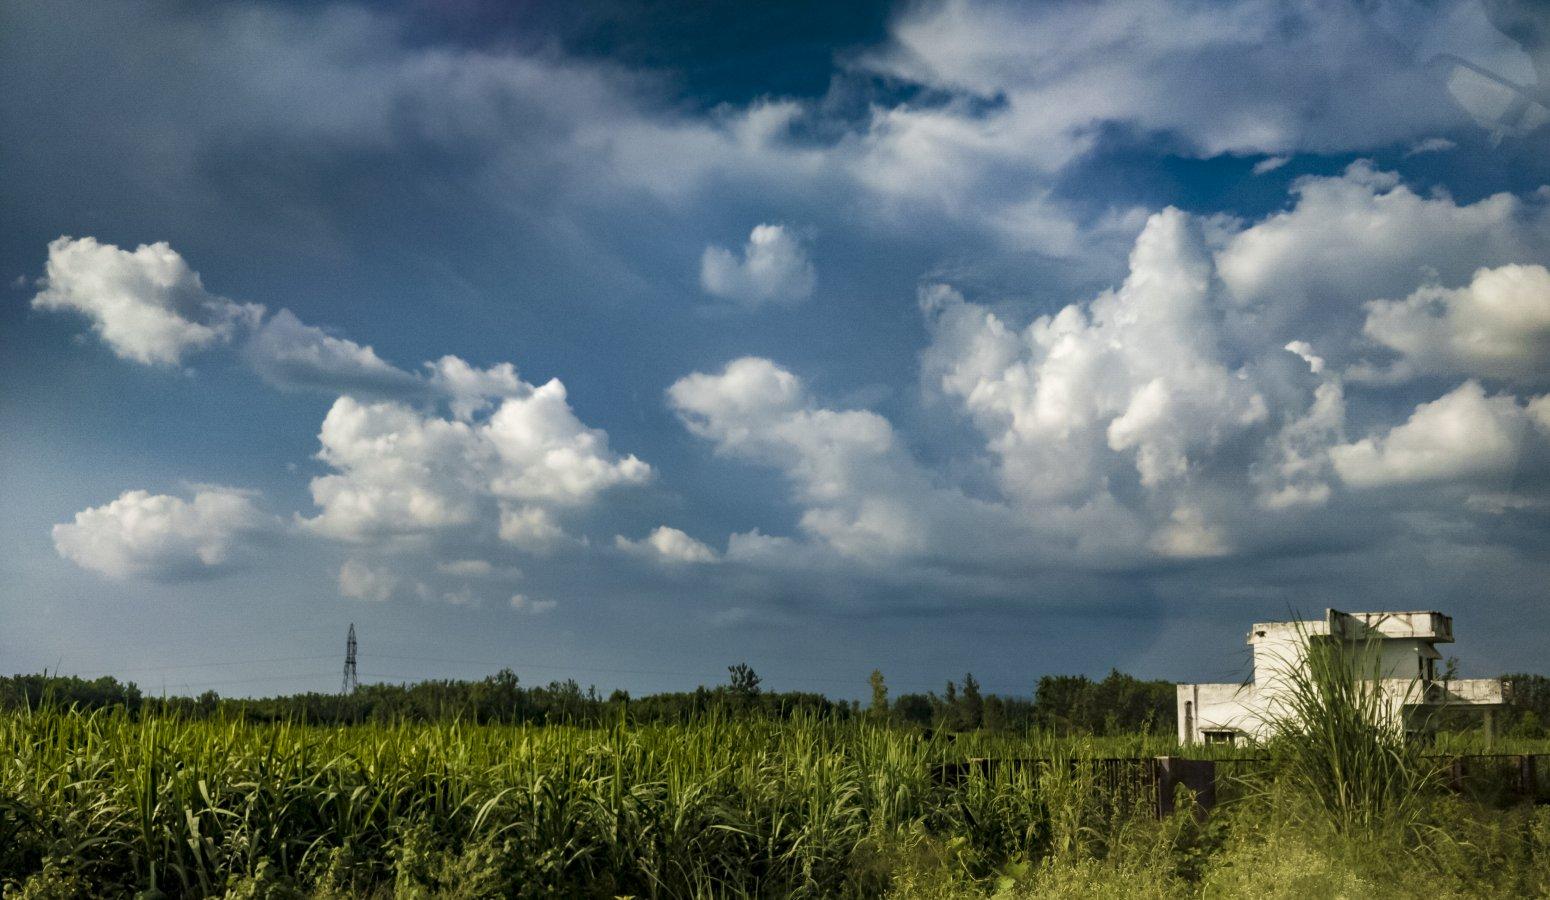 SKY & GRASS.jpg